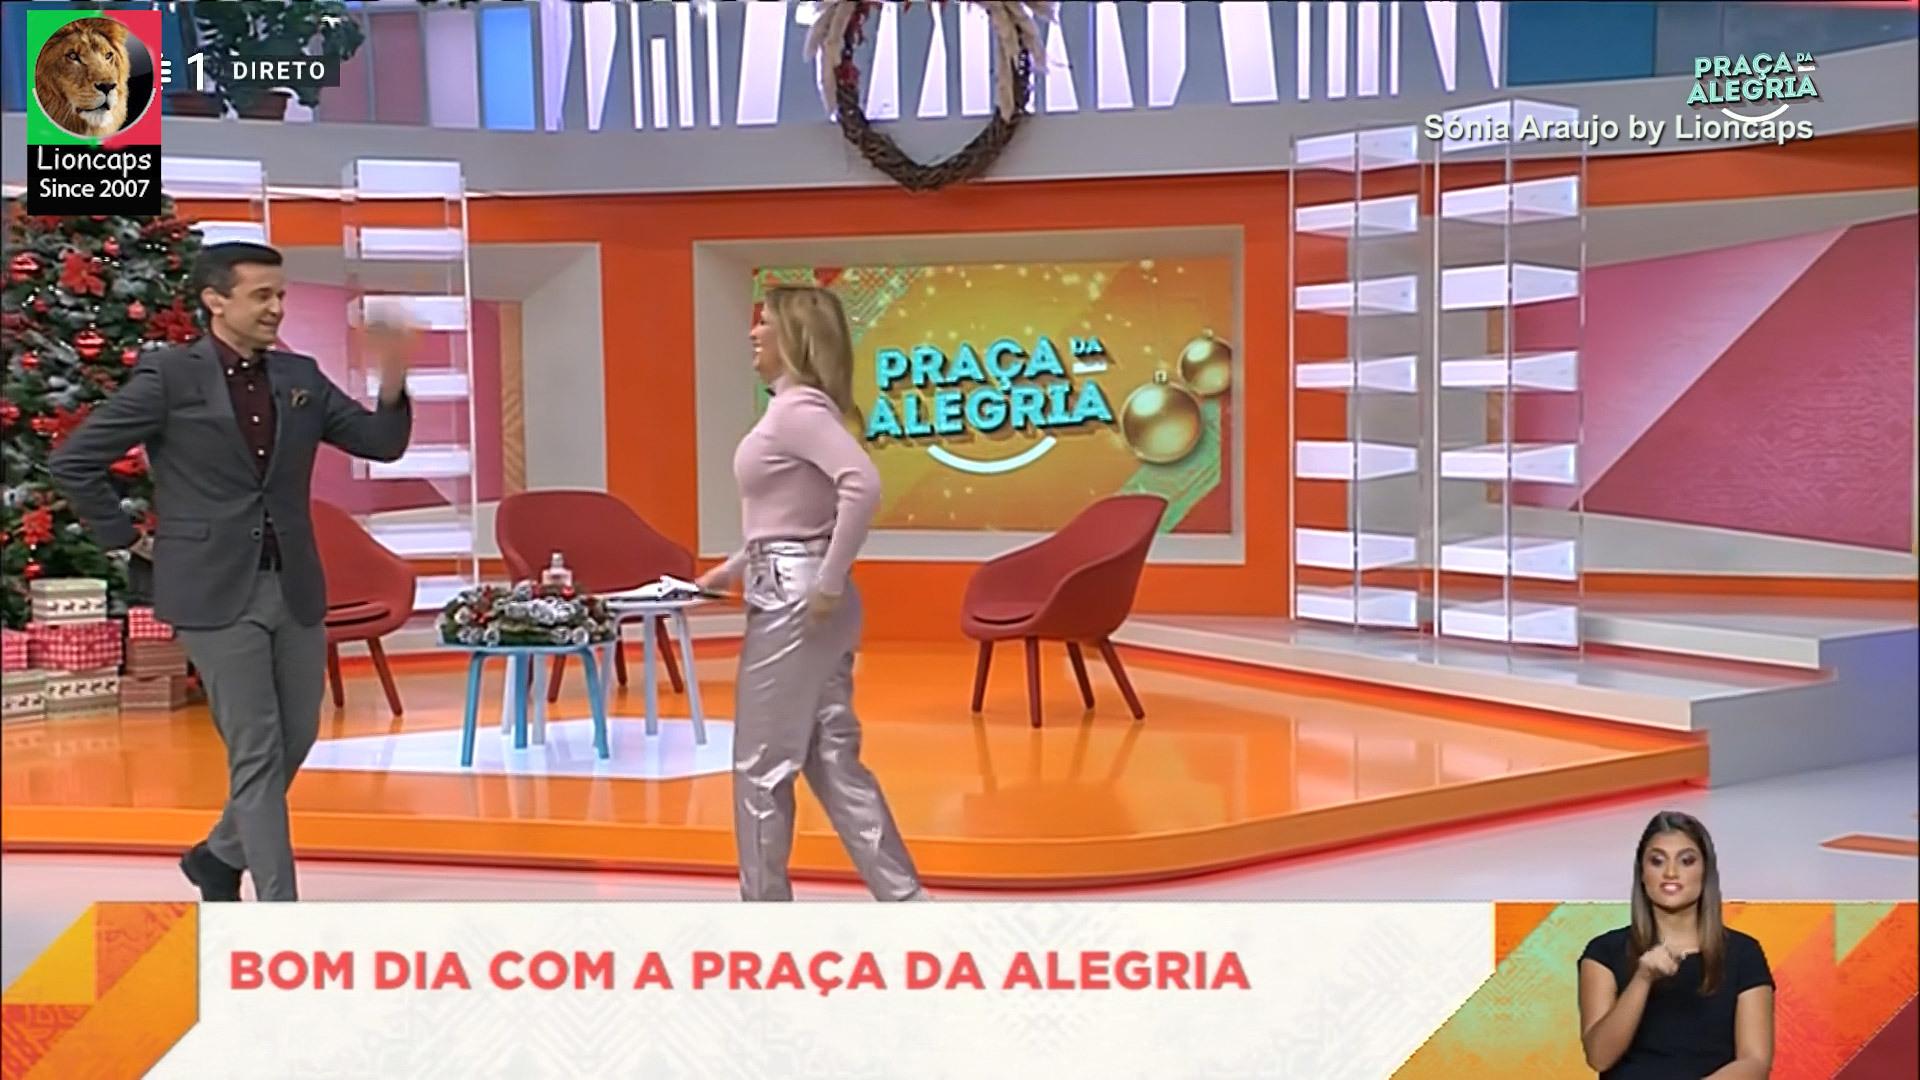 sonia_araujo_praca_lioncaps_27_03_2021_02 (9).jpg